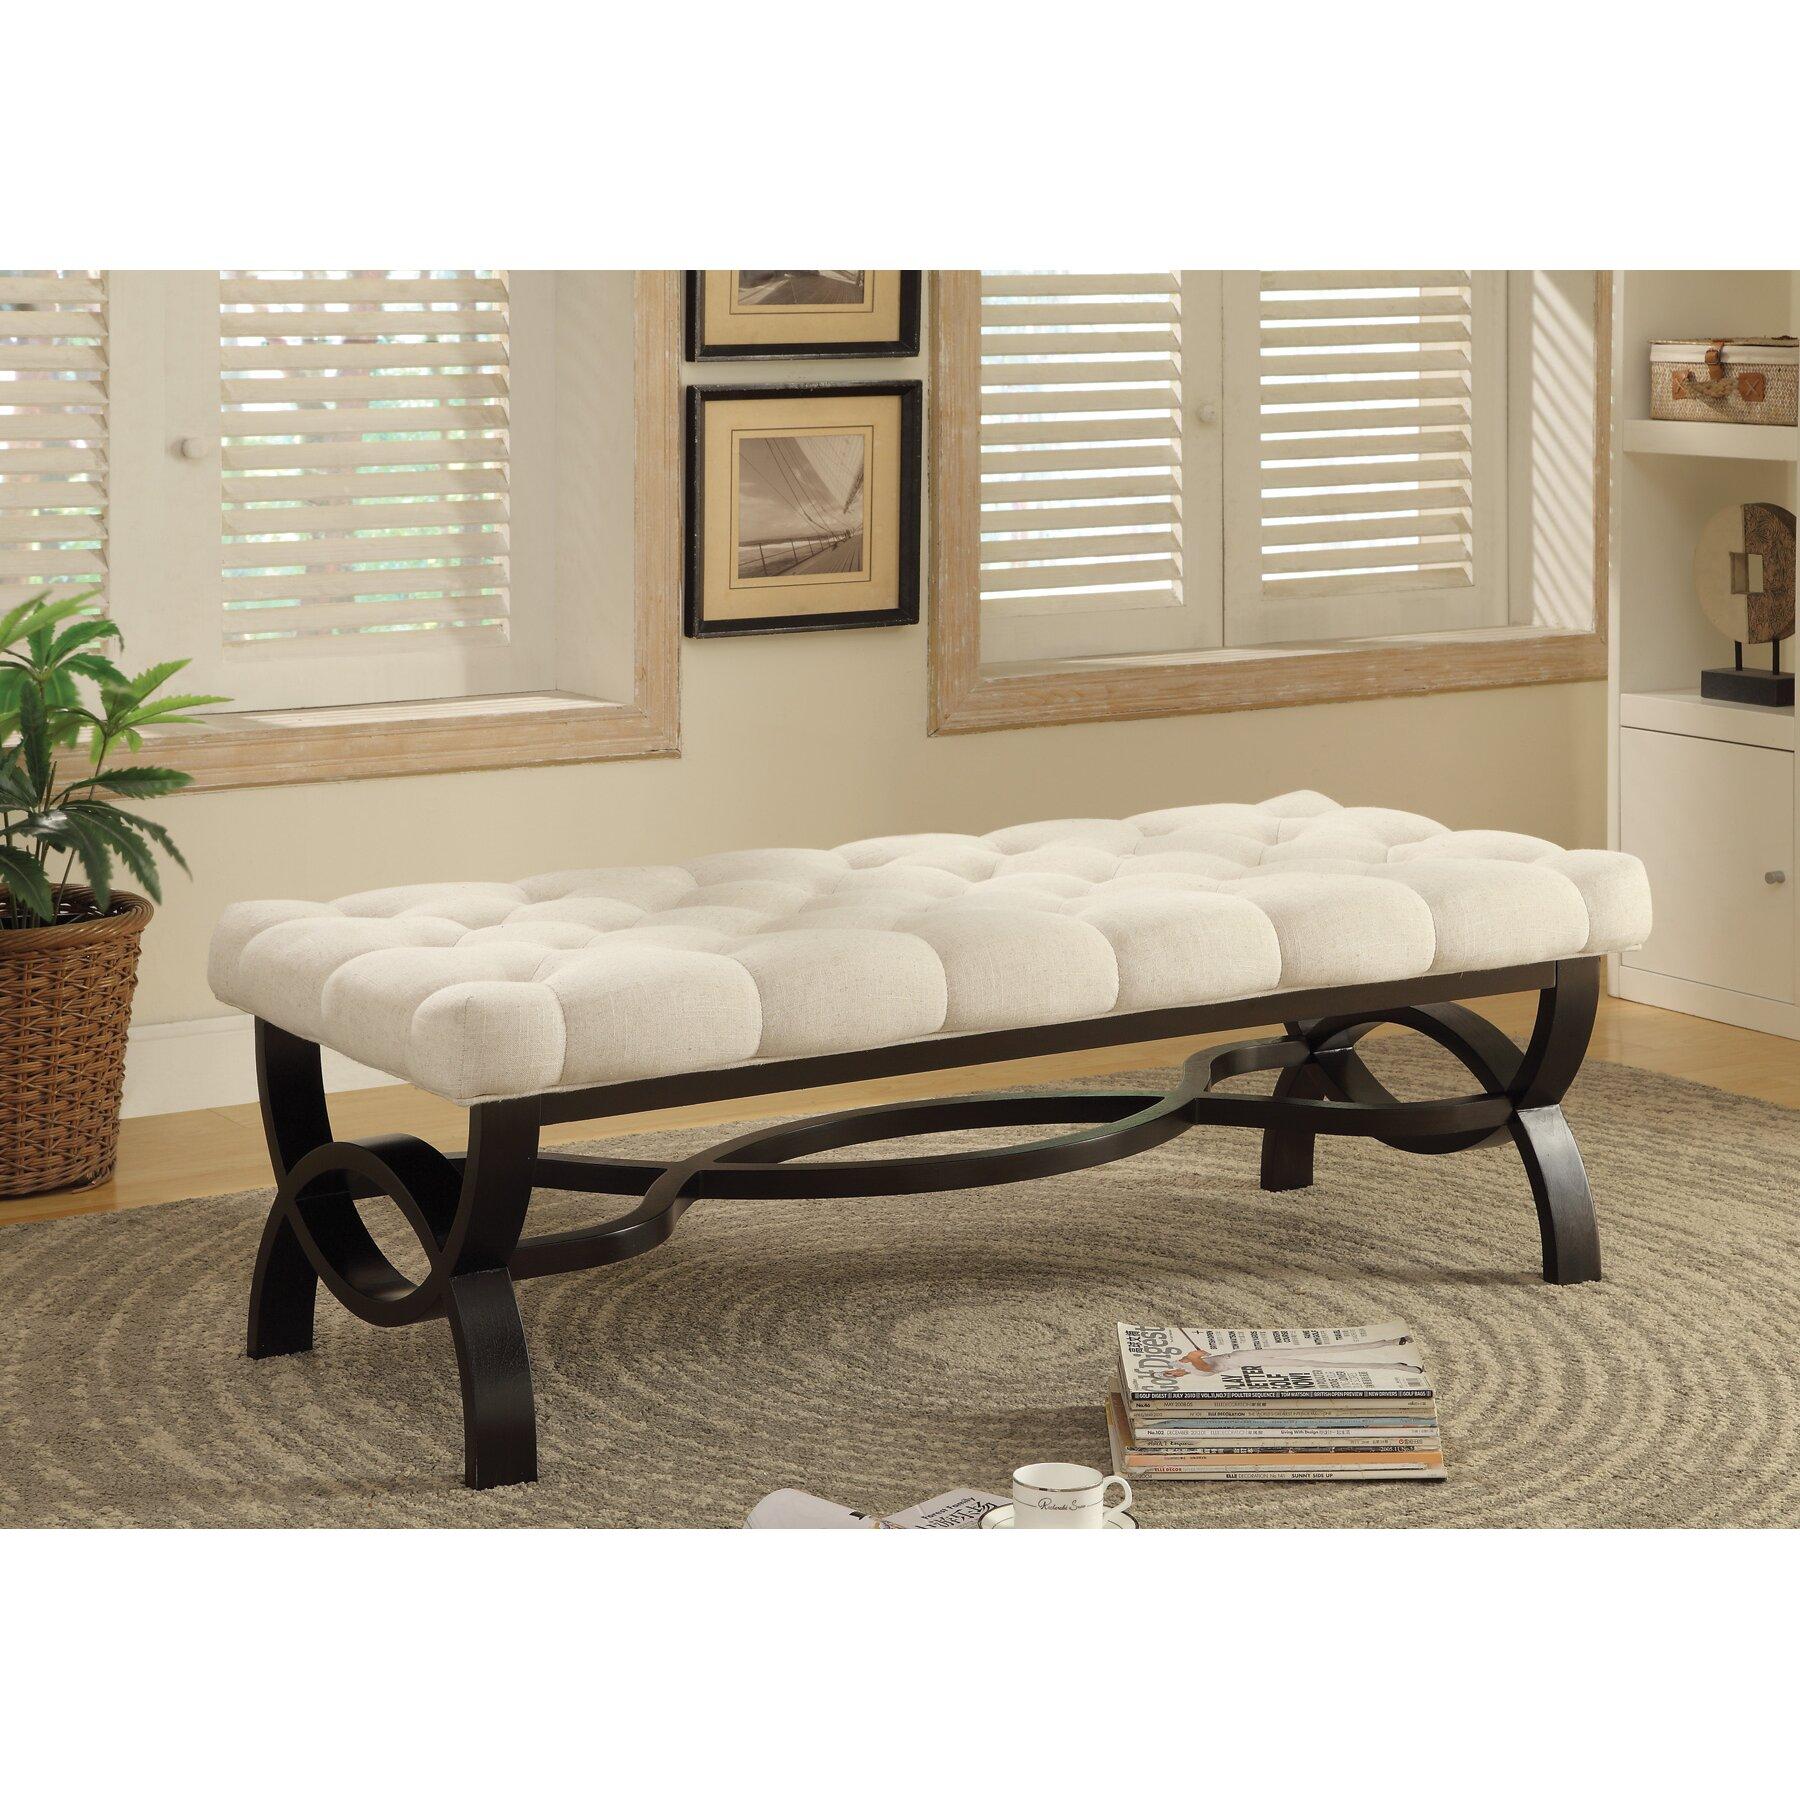 Wildon Home Bedroom Bench Reviews Wayfair - Wildon home upholstered bedroom bench wildon home 174 bedroom bench reviews wayfair